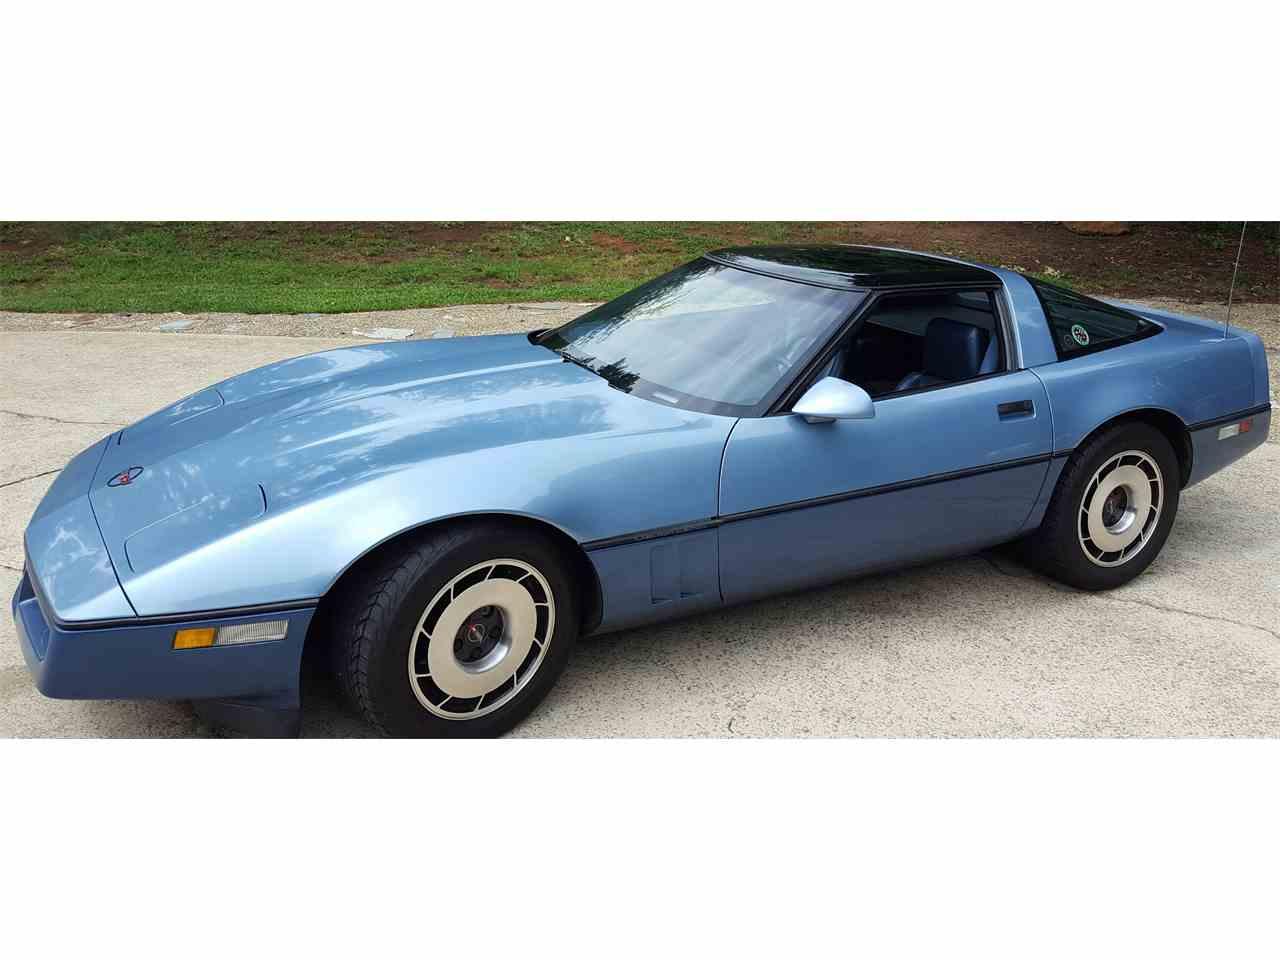 1985 Chevrolet  Corvette for Sale - CC-994282